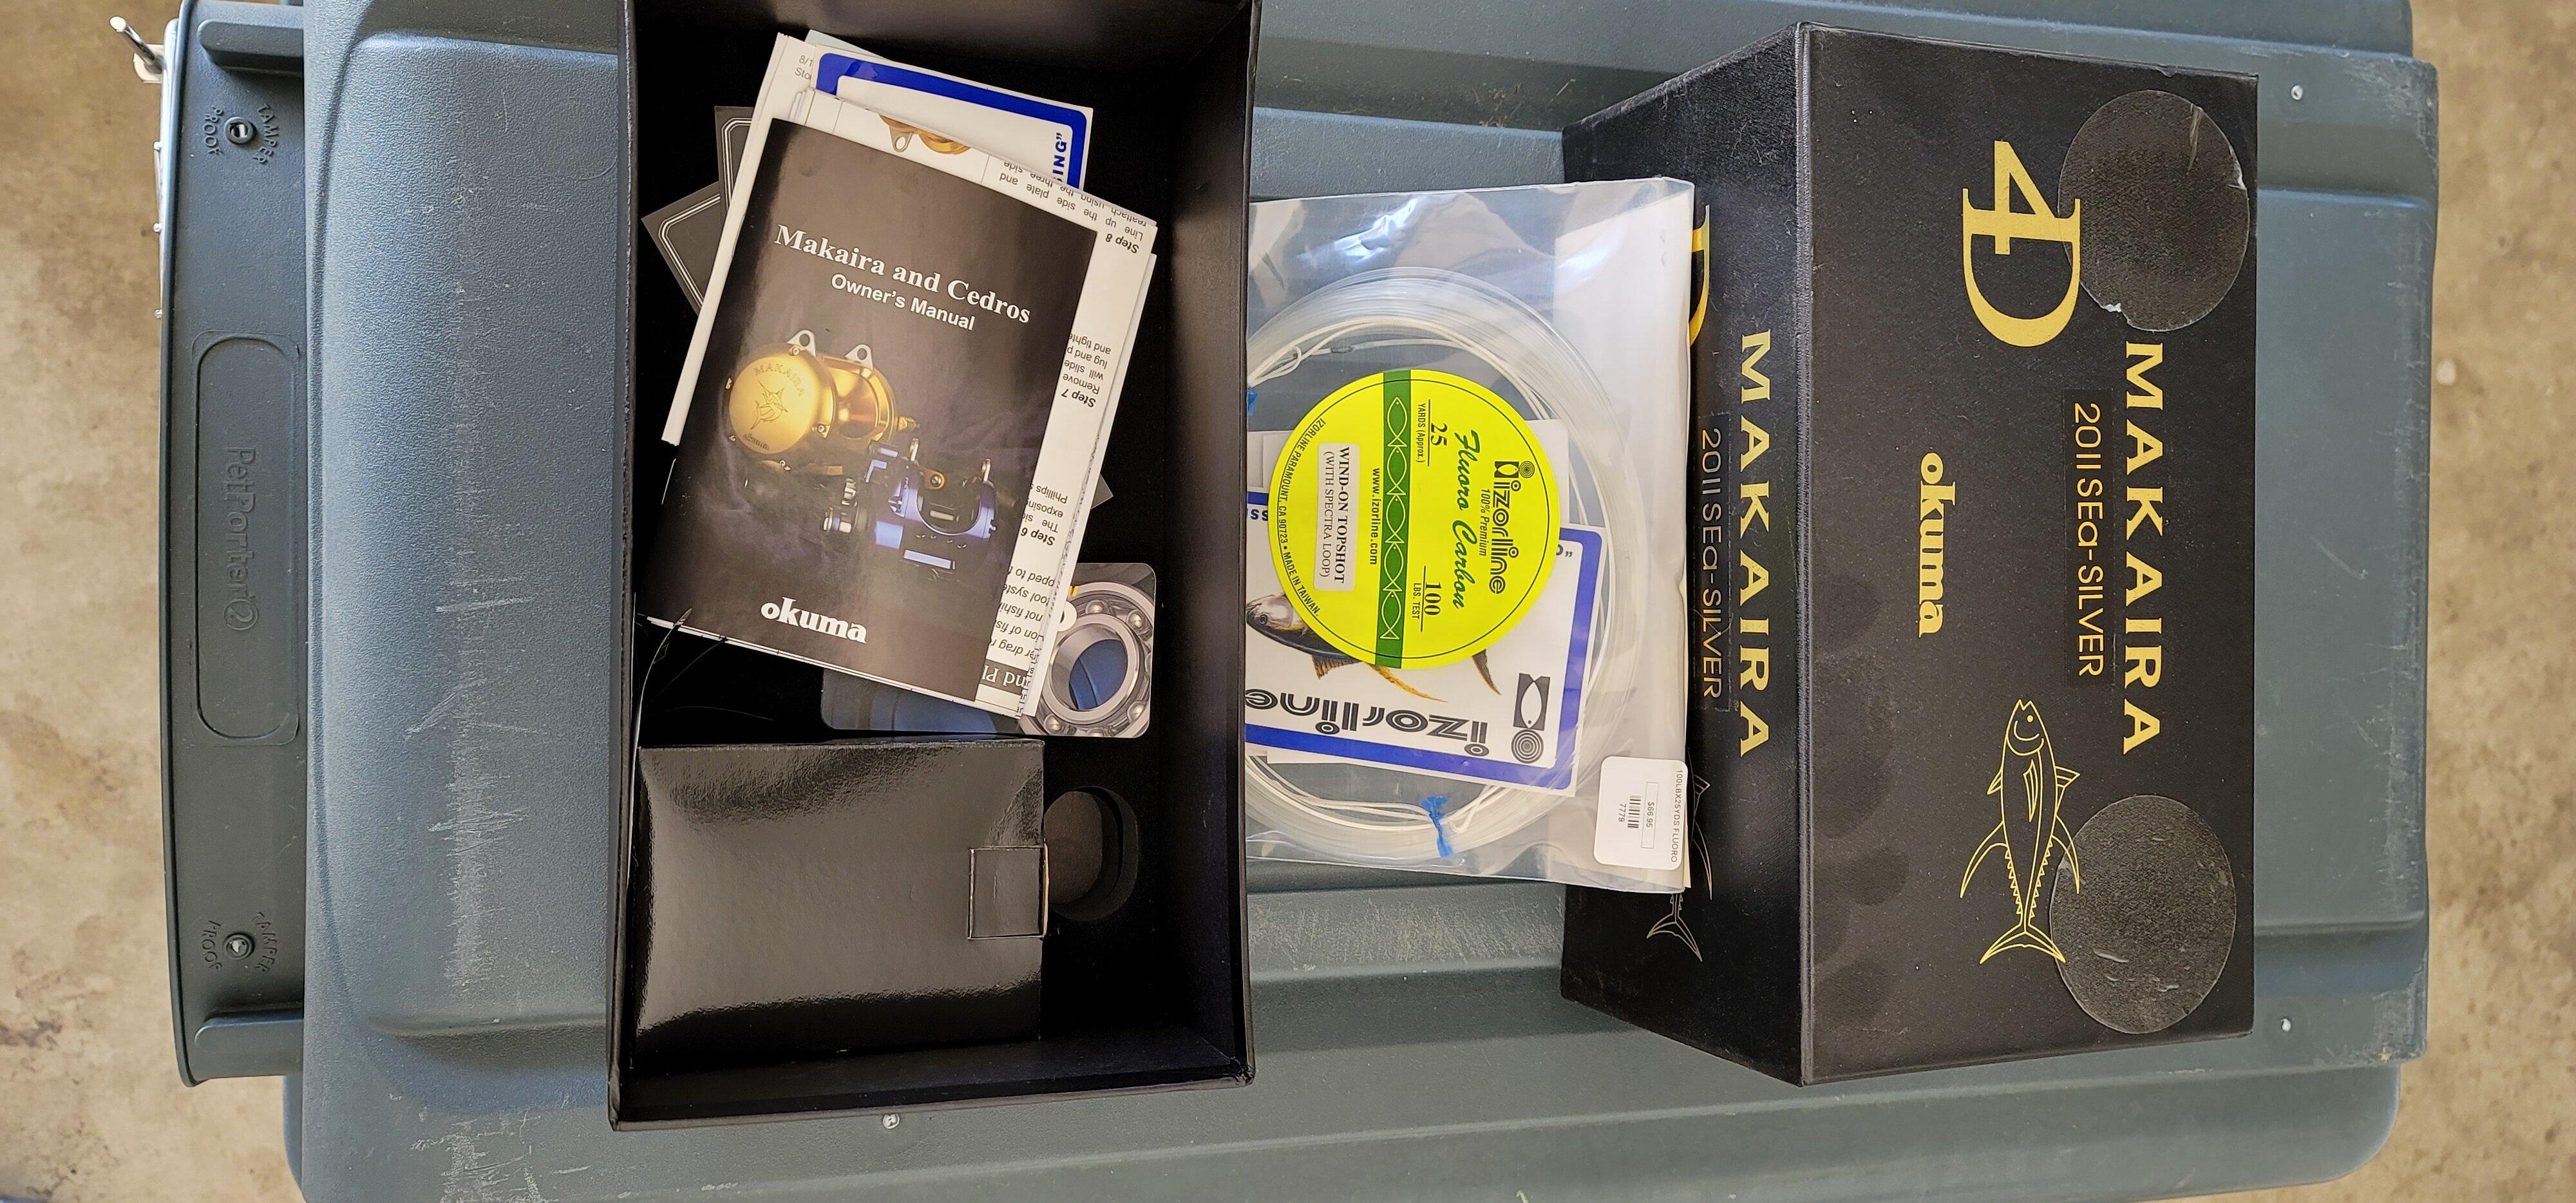 Makaira 20II SEa - Silver box open.jpg